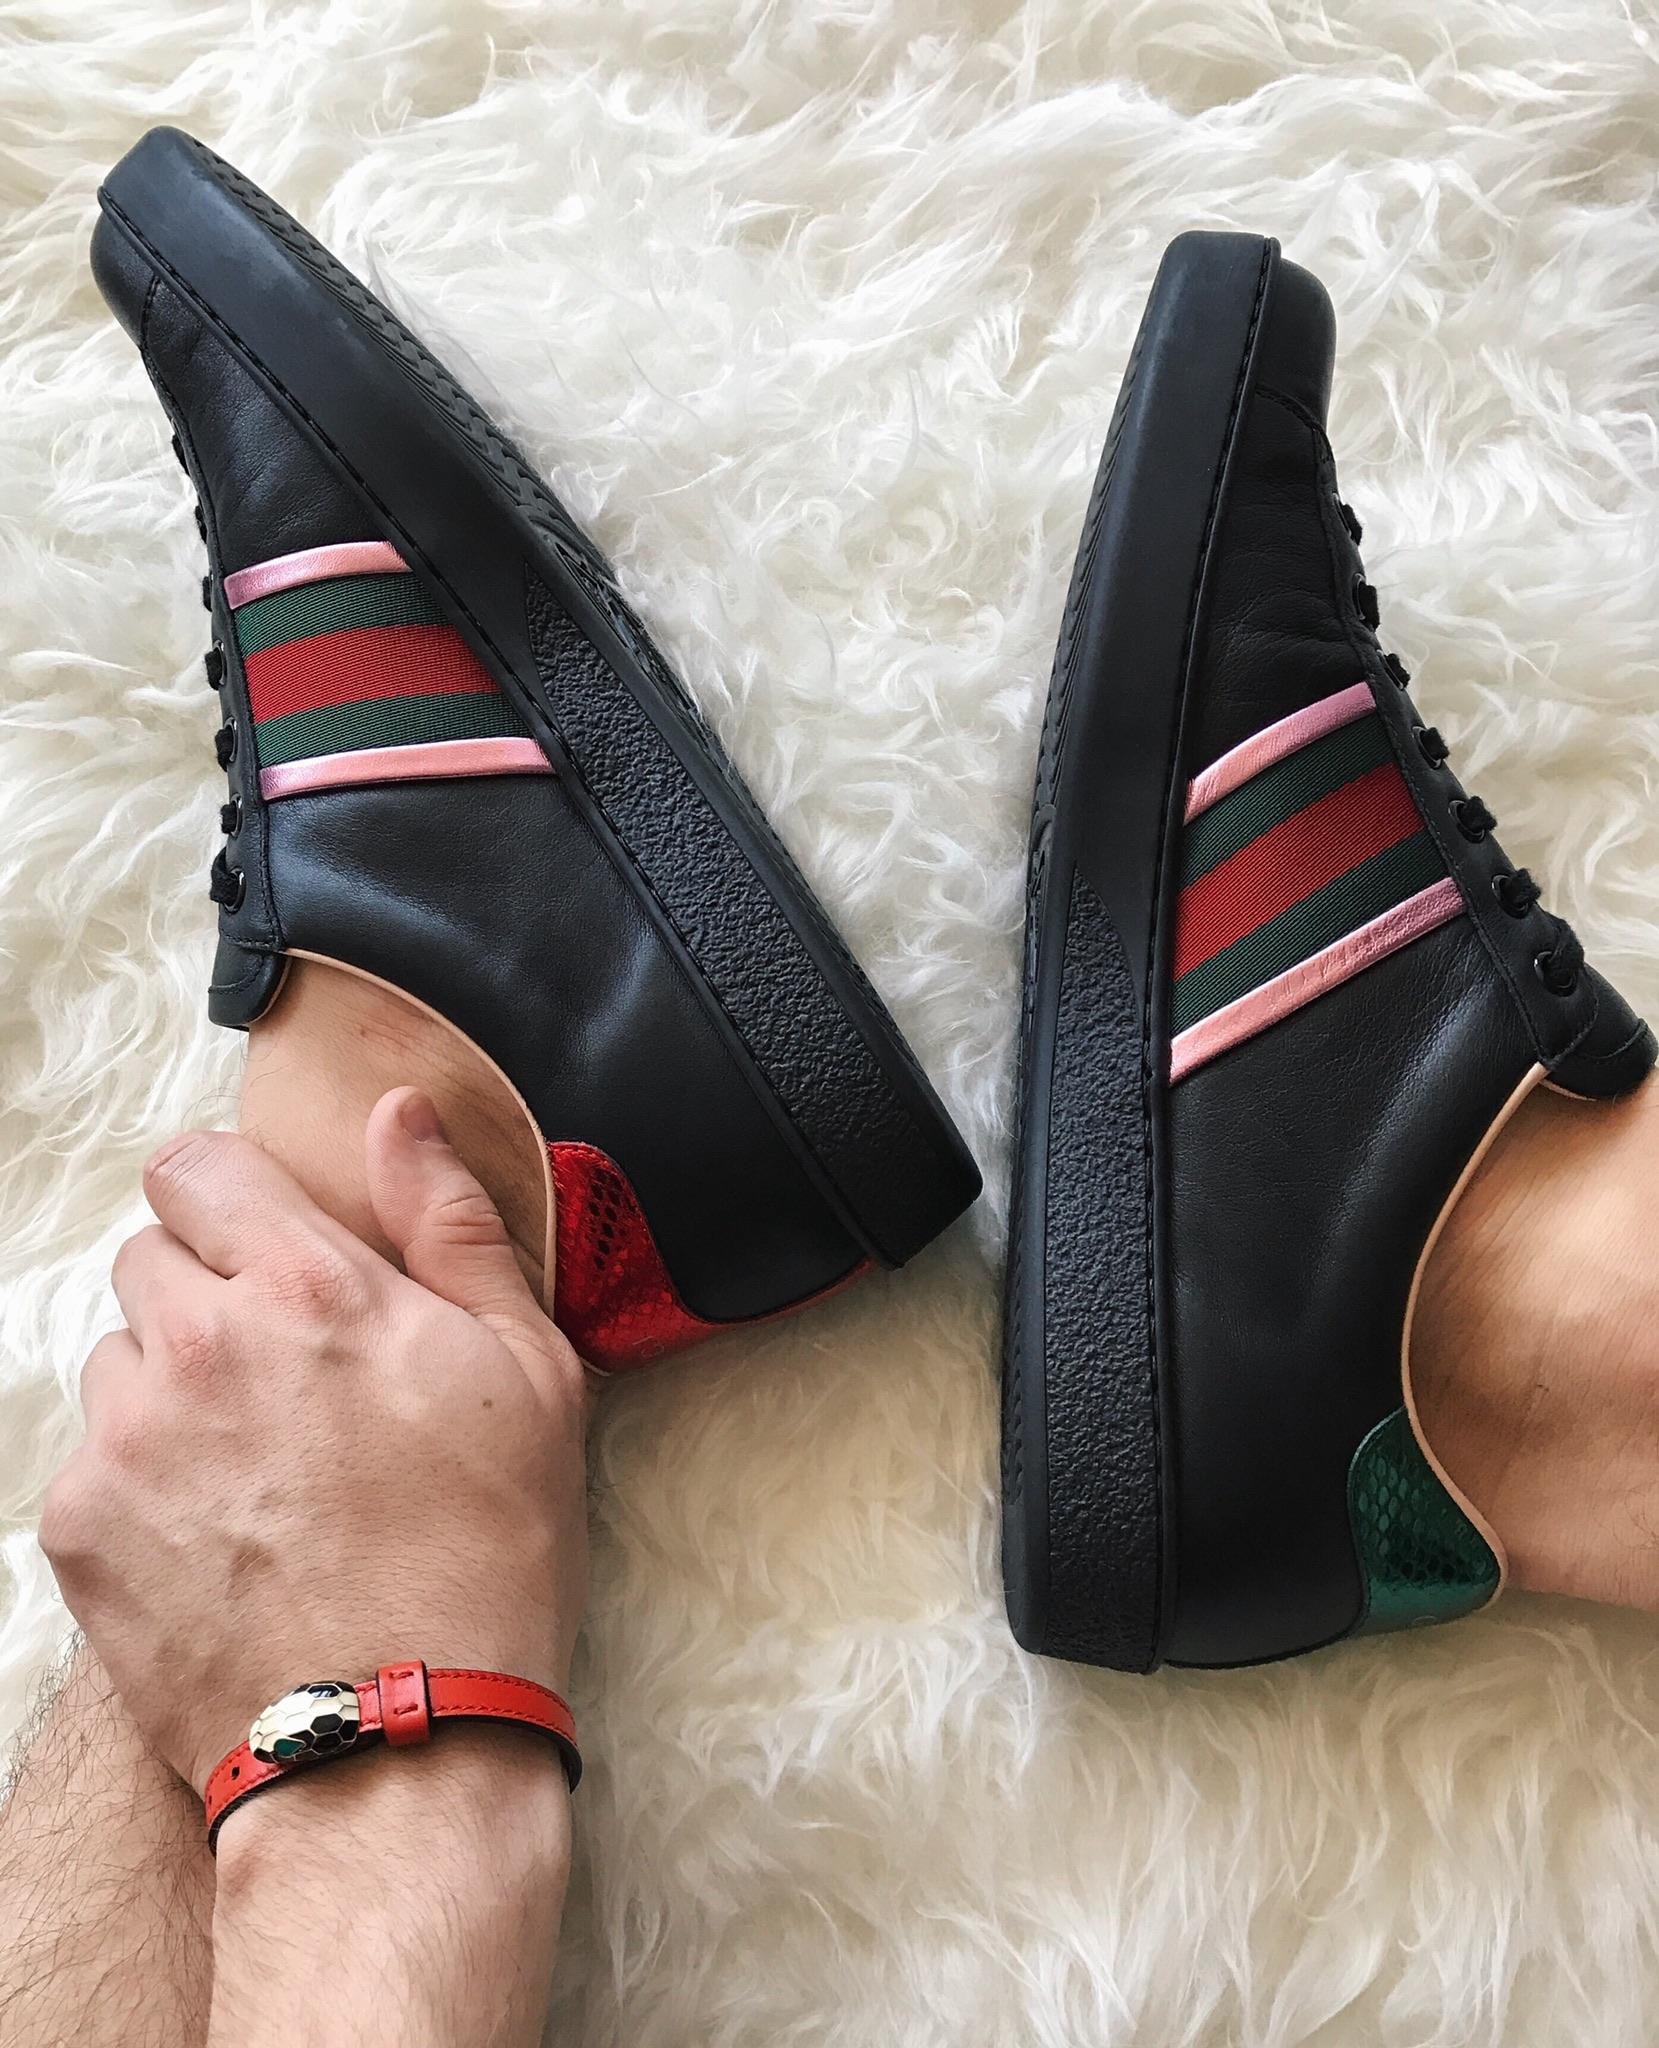 Shoe of the Week: Gucci Ace Sneaker Low